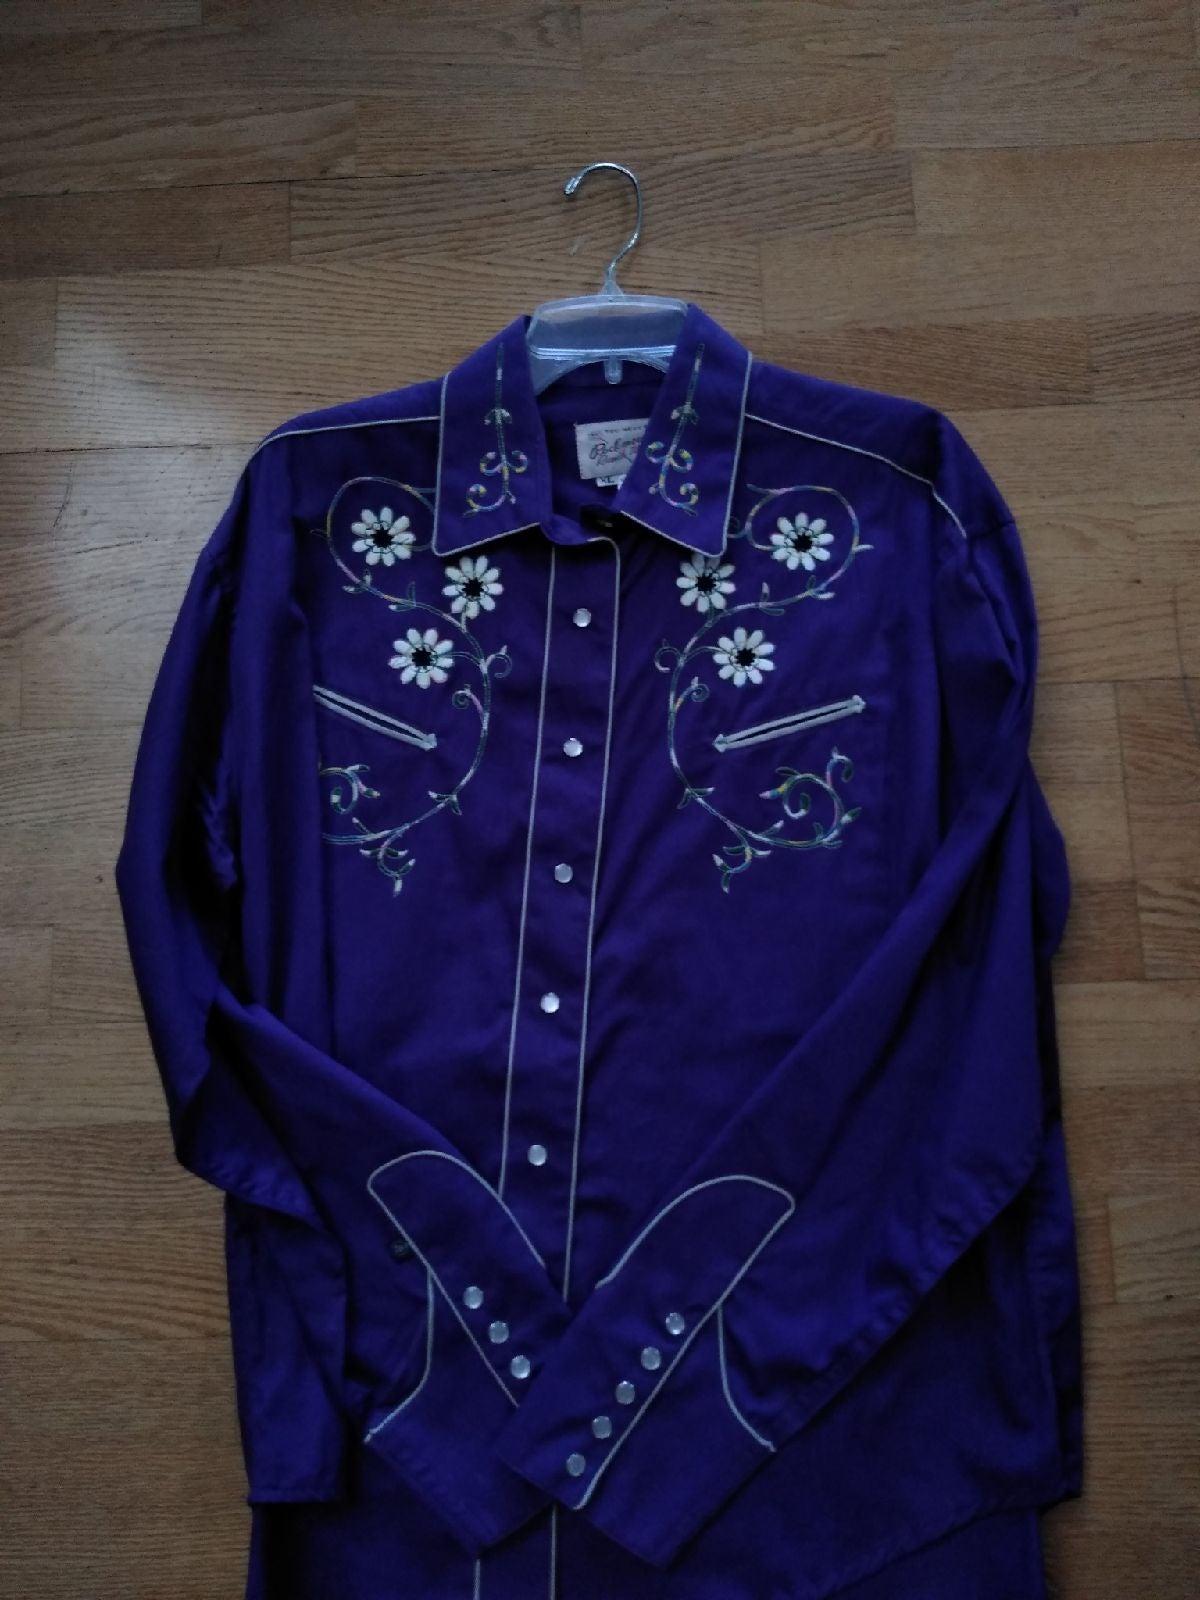 Vintage Rockmount embroidered shirt